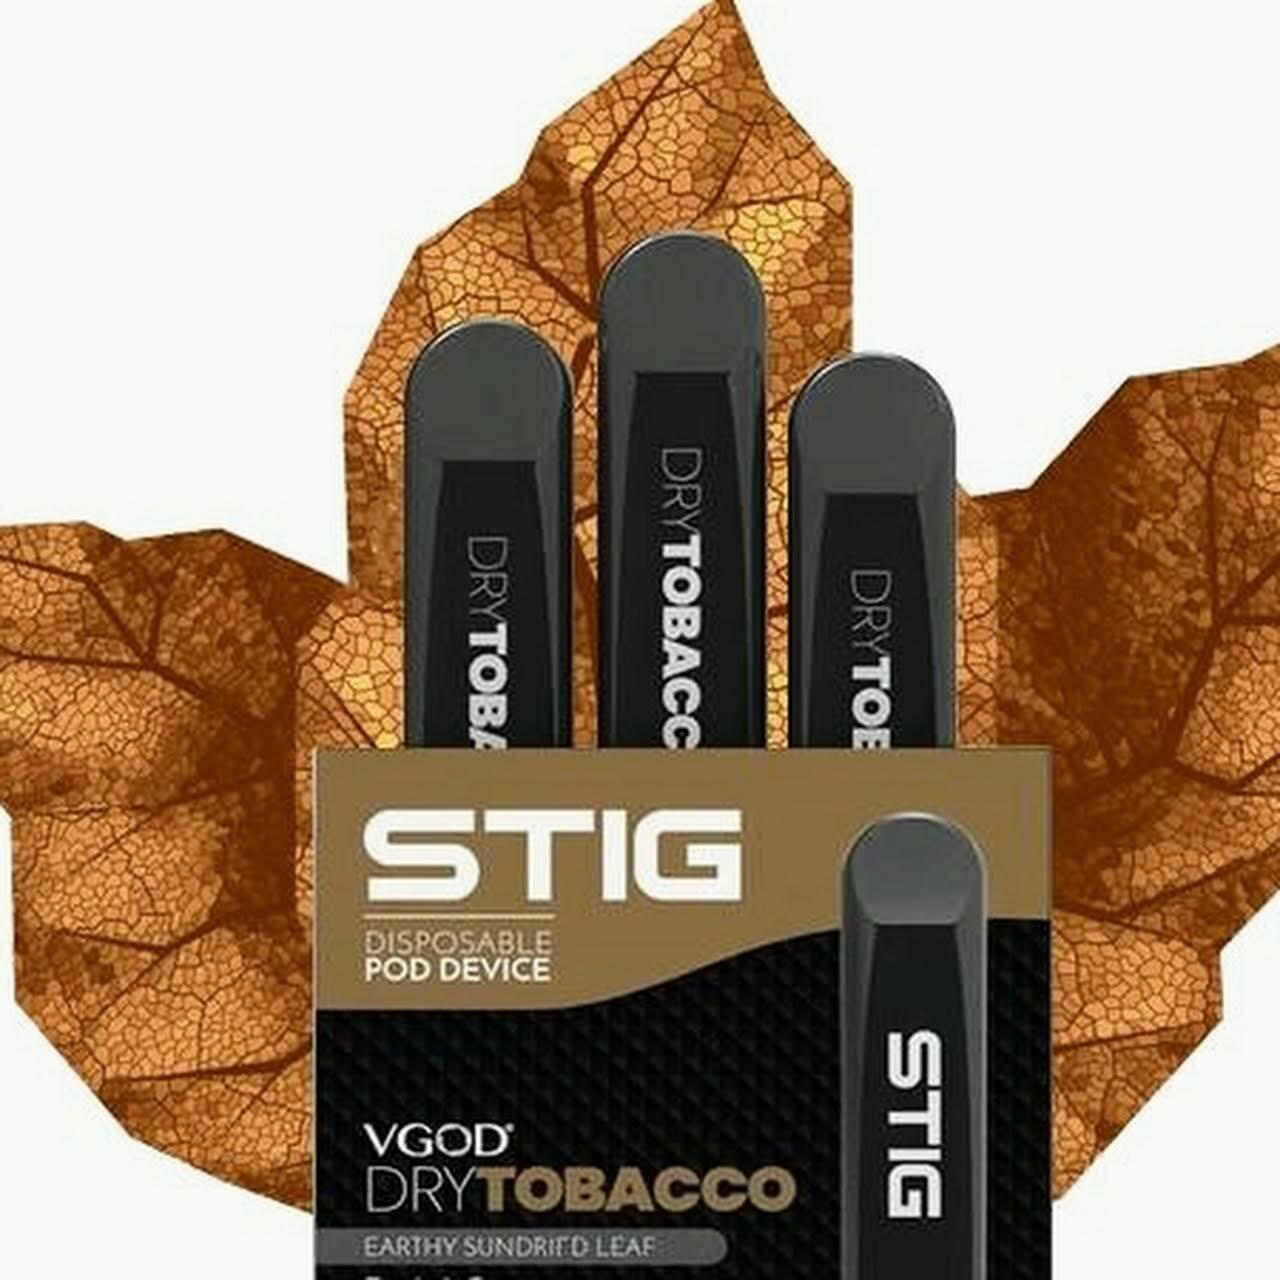 STIG Dry Tobacco 3-Pack Disposable Device - علبة 3 تبغ صافي من ستيج